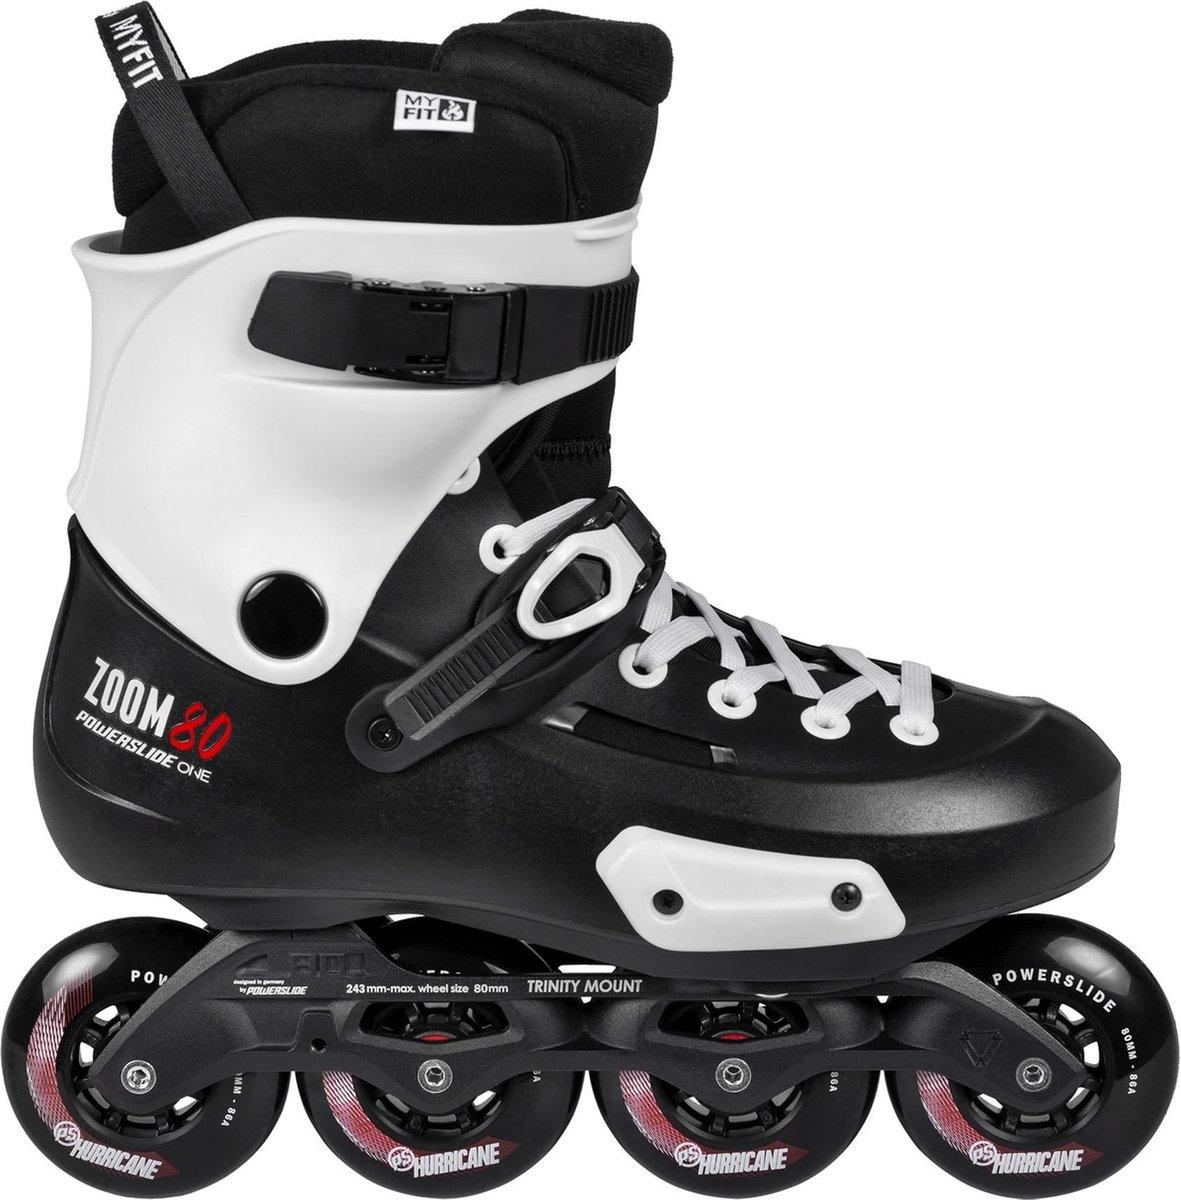 Powerslide One Zoom 80 Inline Skate Senior Inlineskates - Maat 39/40 - Unisex - zwart/wit